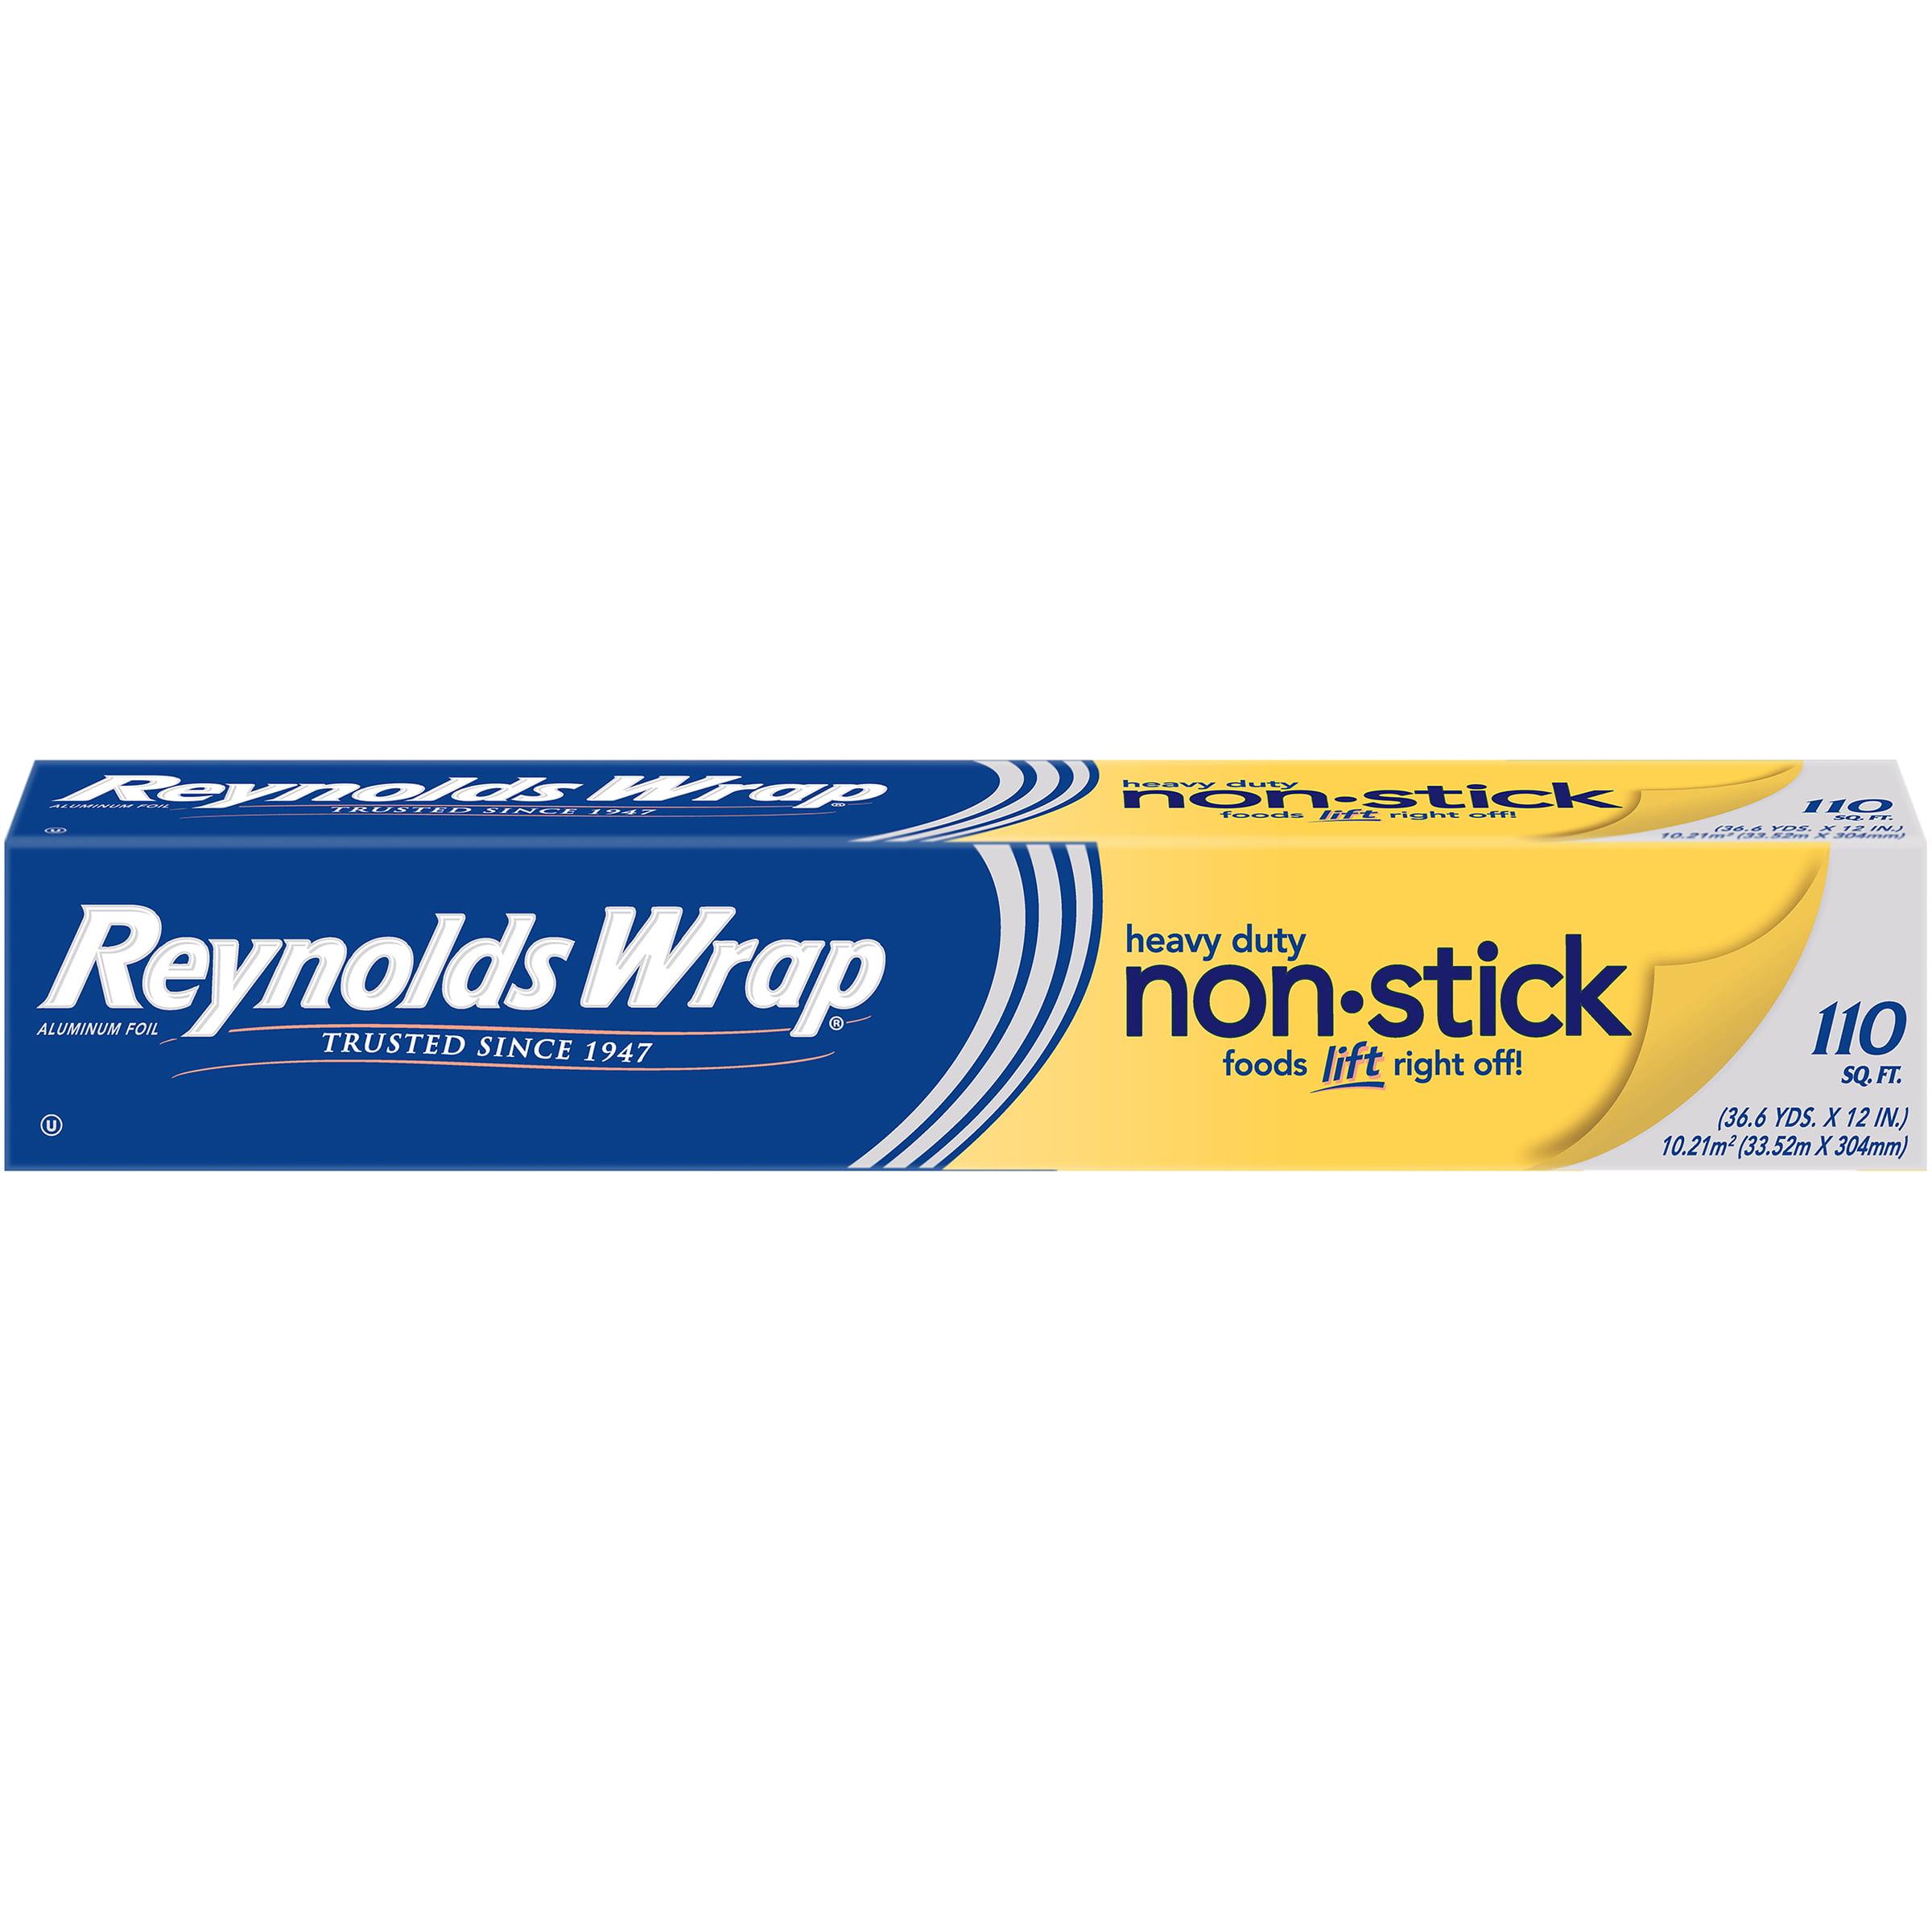 Reynolds Wrap Non-Stick Heavy Duty Aluminum Foil, 110 Square Feet